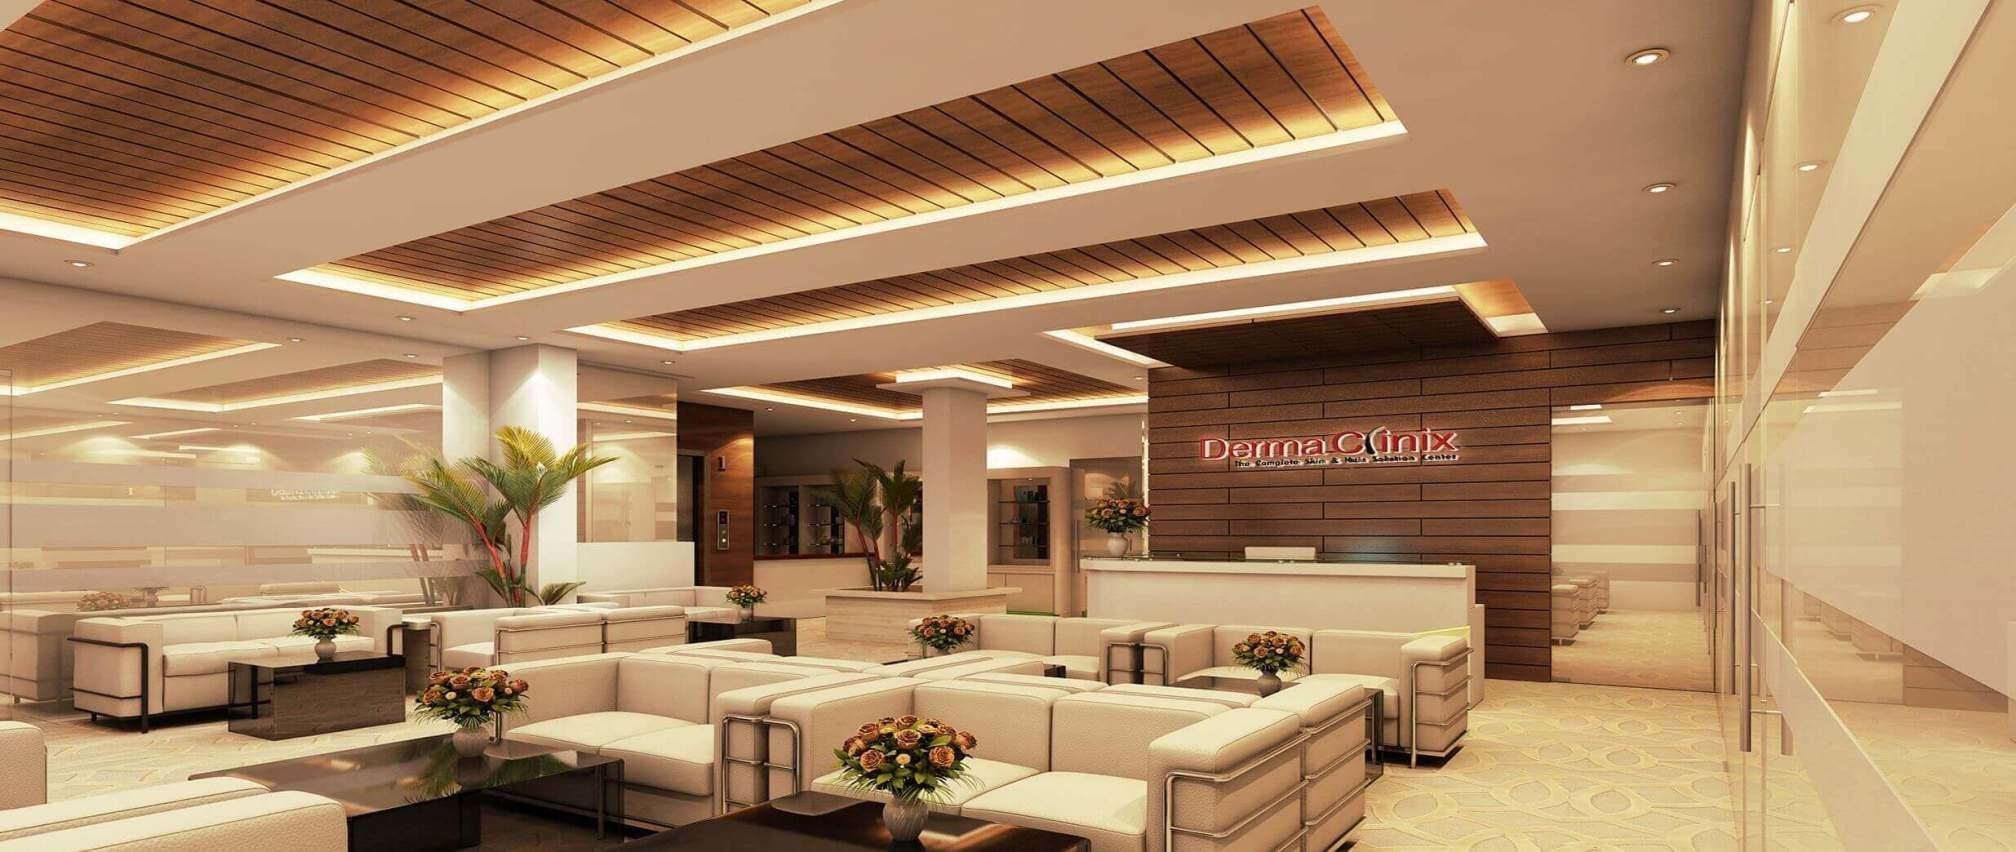 DermaClinix Photo1